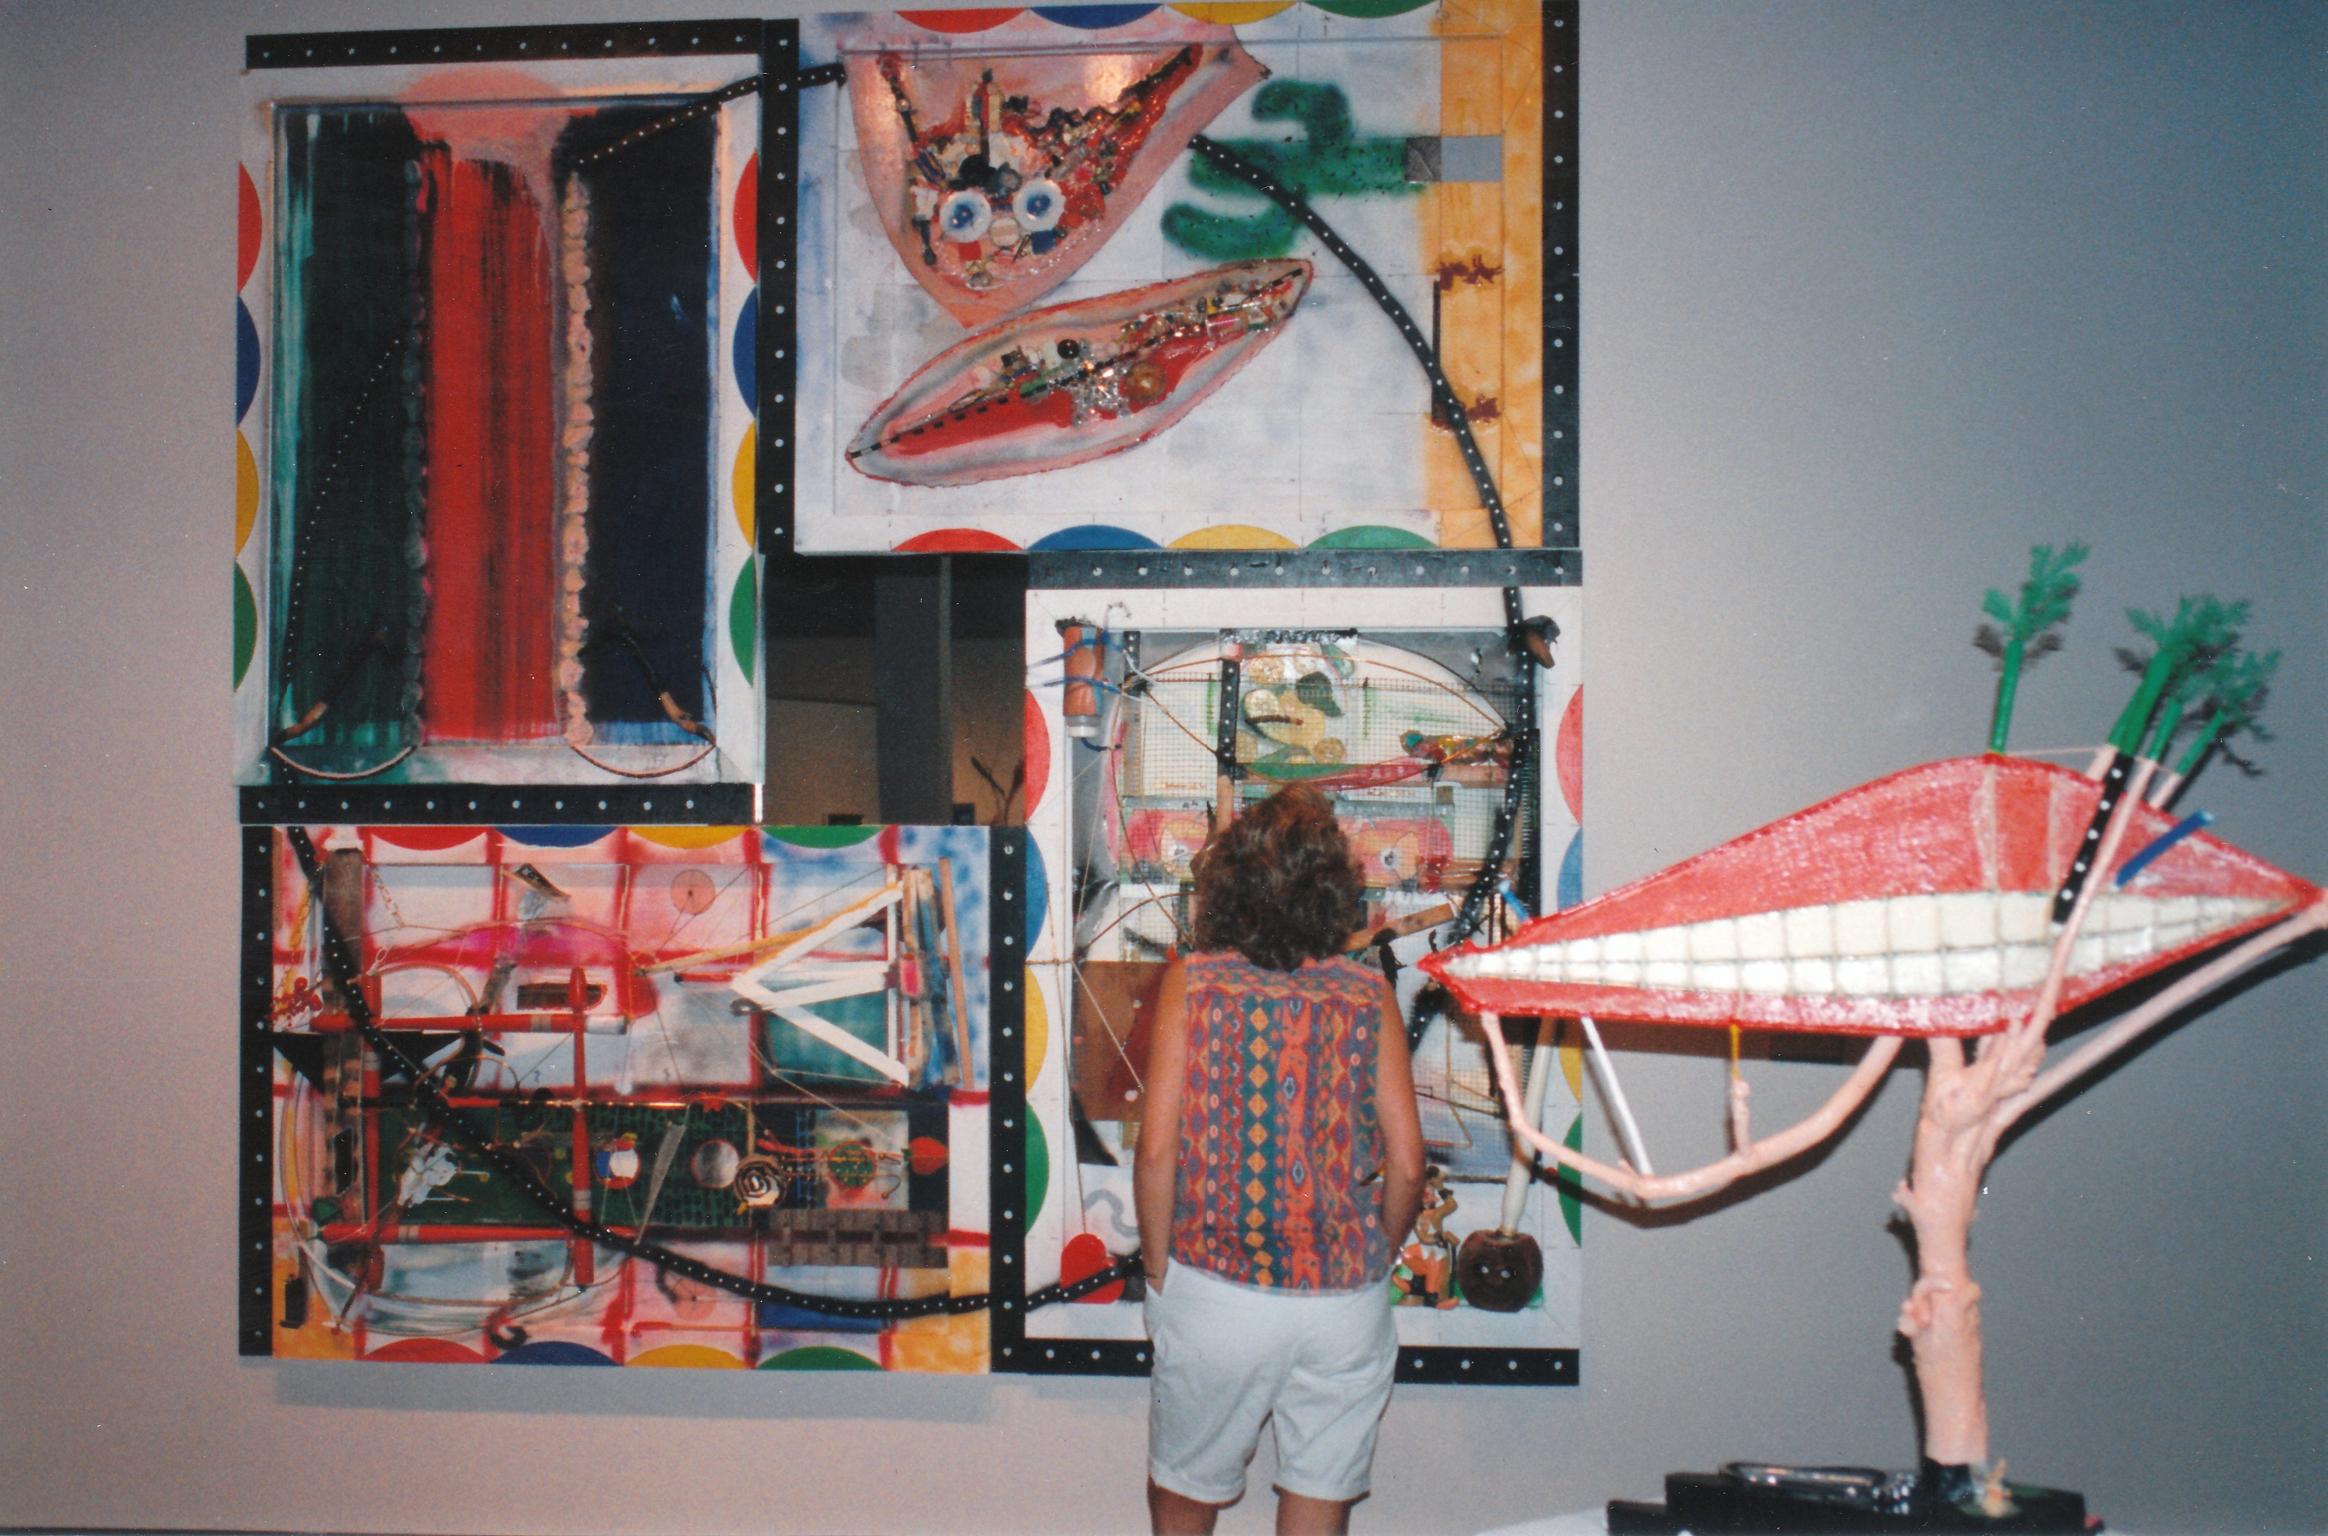 1994-City Gallery Contem. Art-NC_0002.jpg